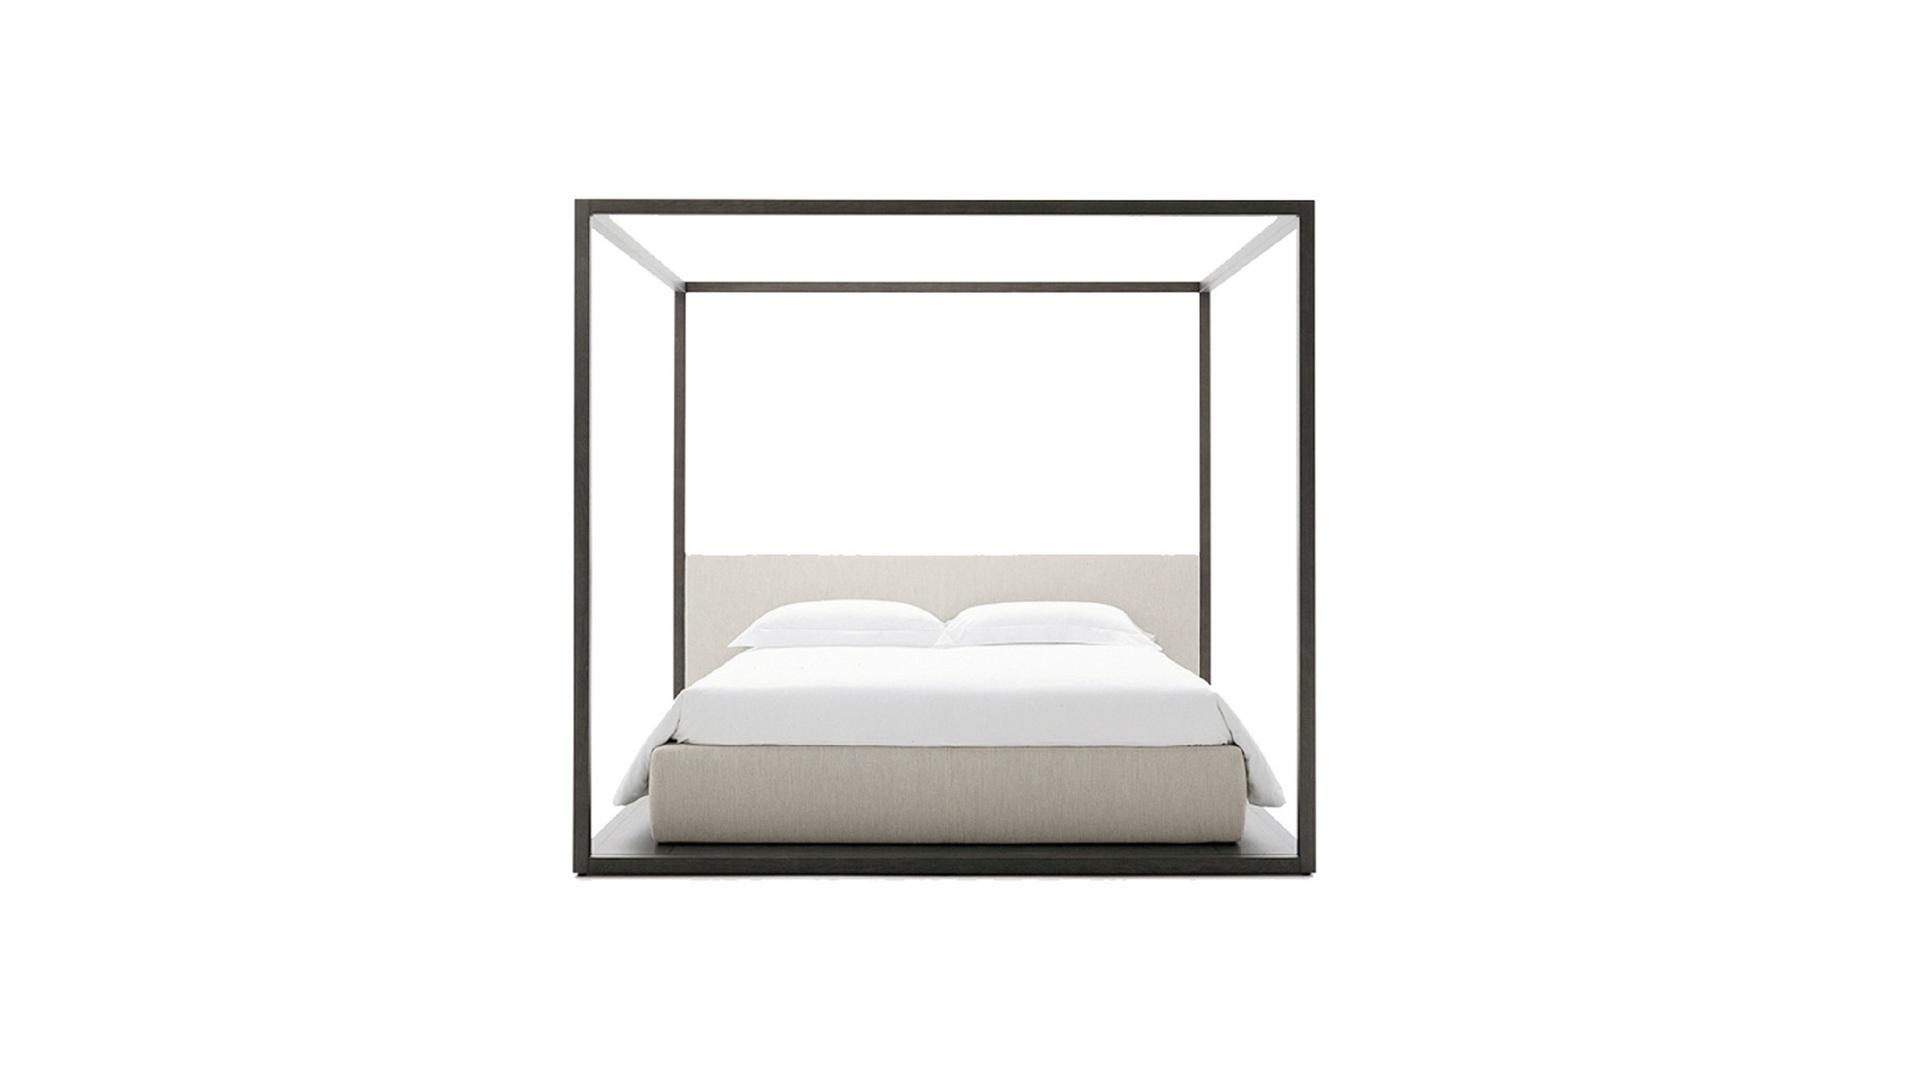 Alcova bed long.jpg